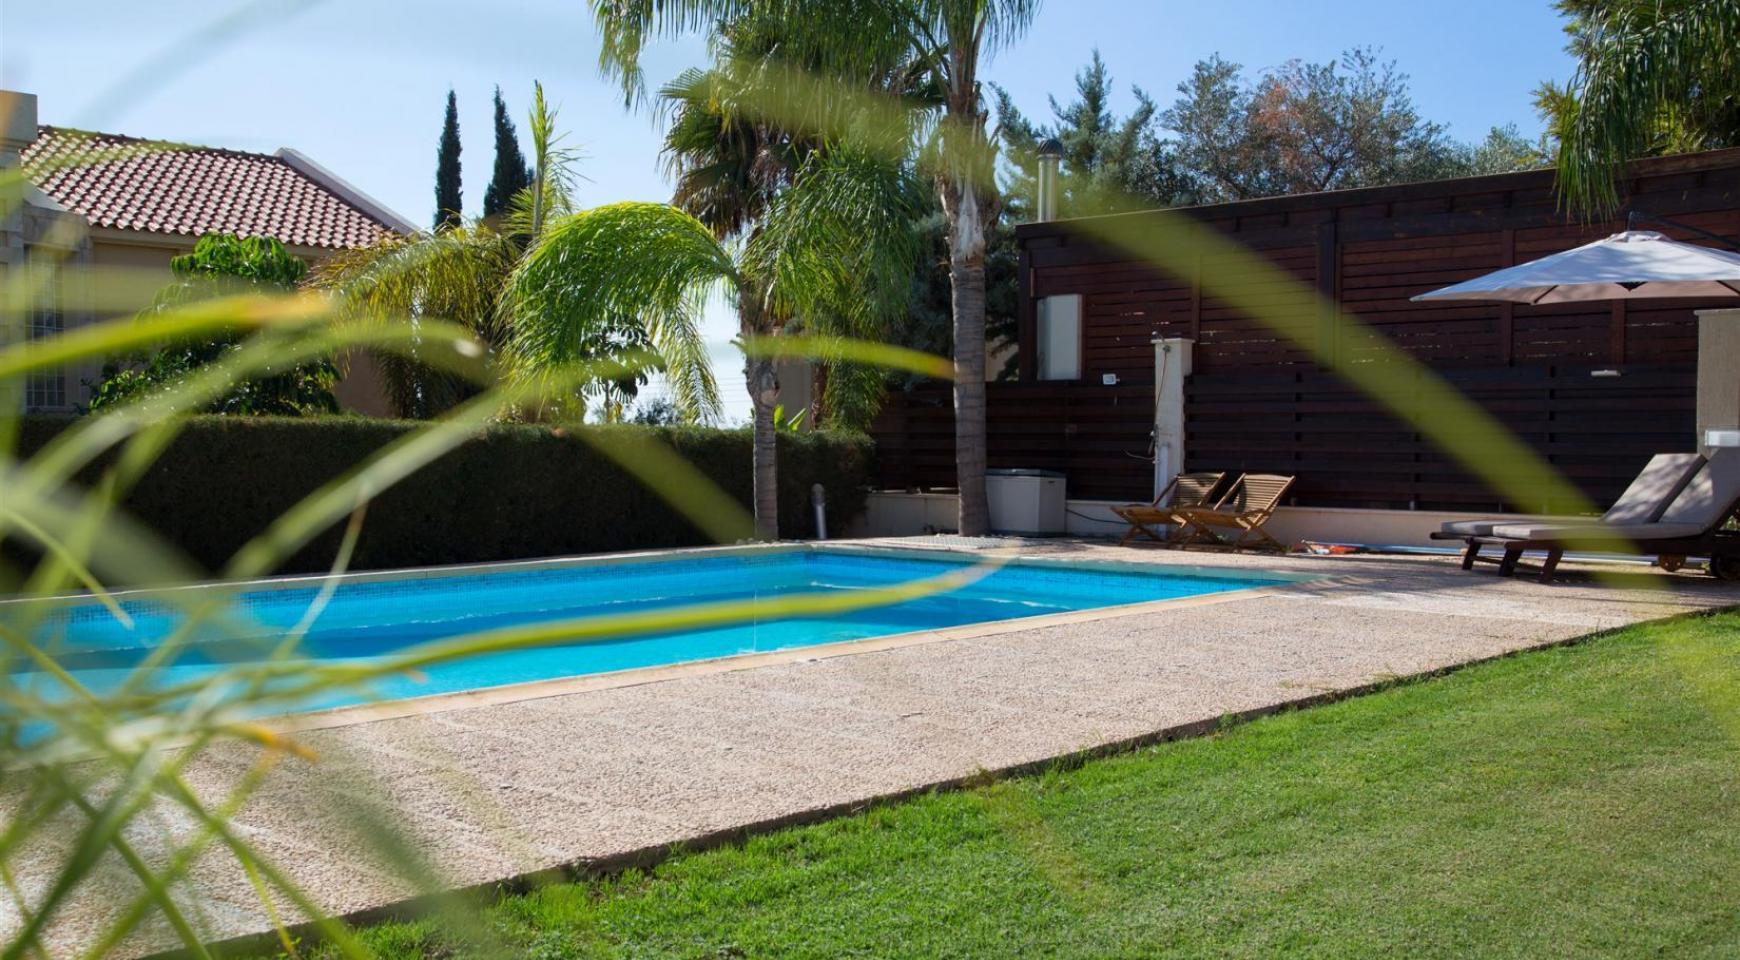 Modern Luxury 4 Bedroom Villa in Sfalagiotisa, Agios Athanasios - 7